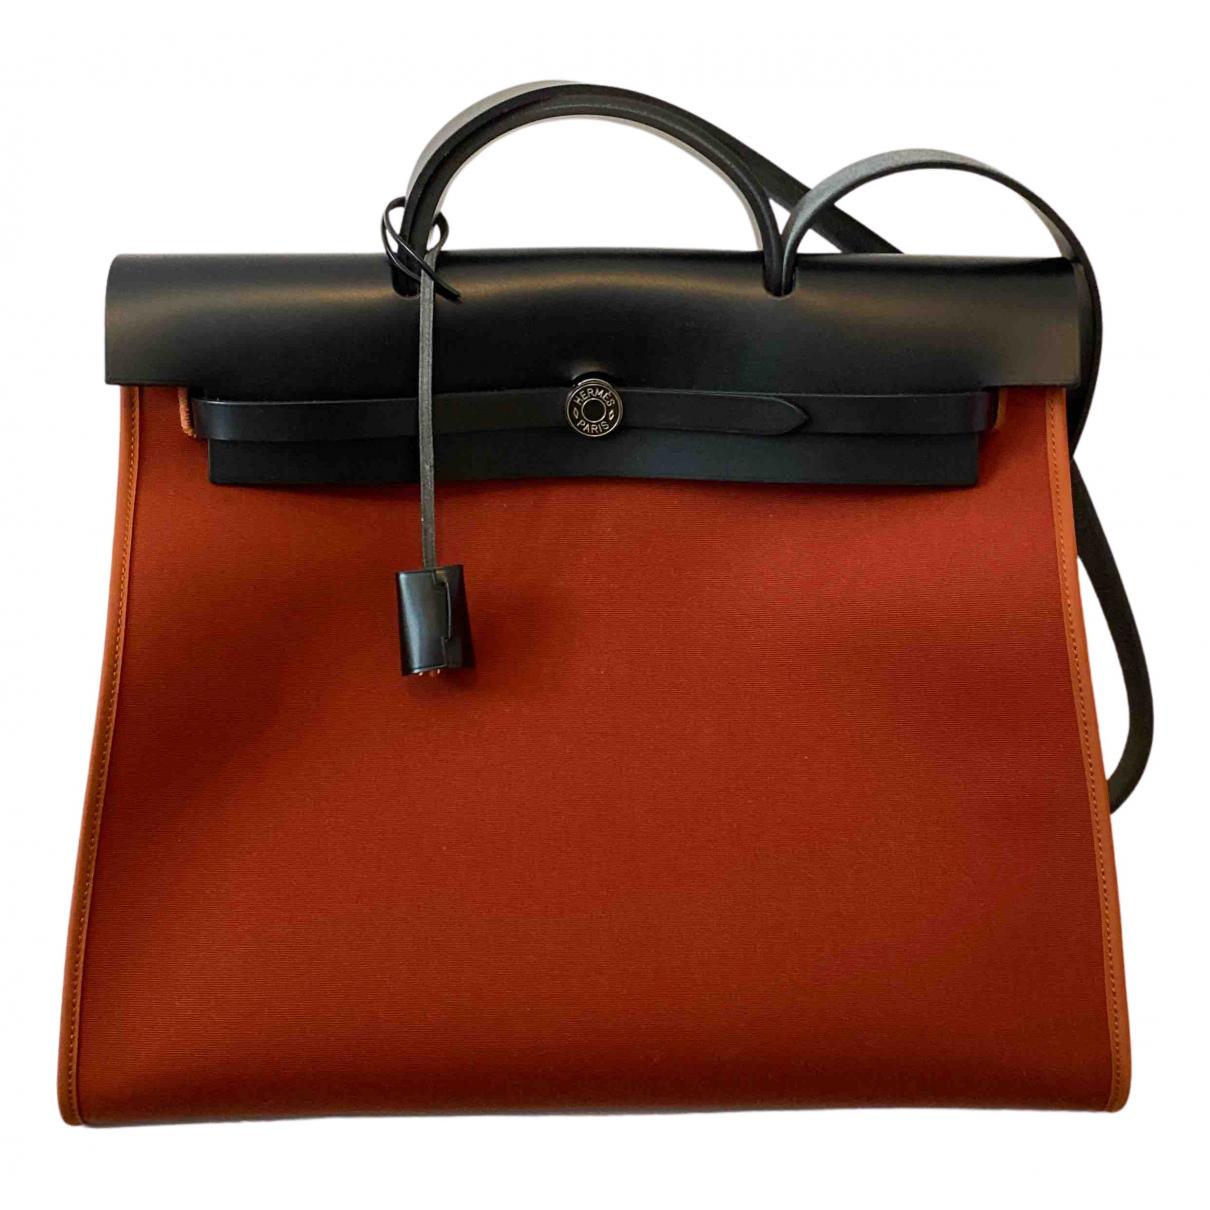 Hermes Herbag Handtasche in  Rot Baumwolle